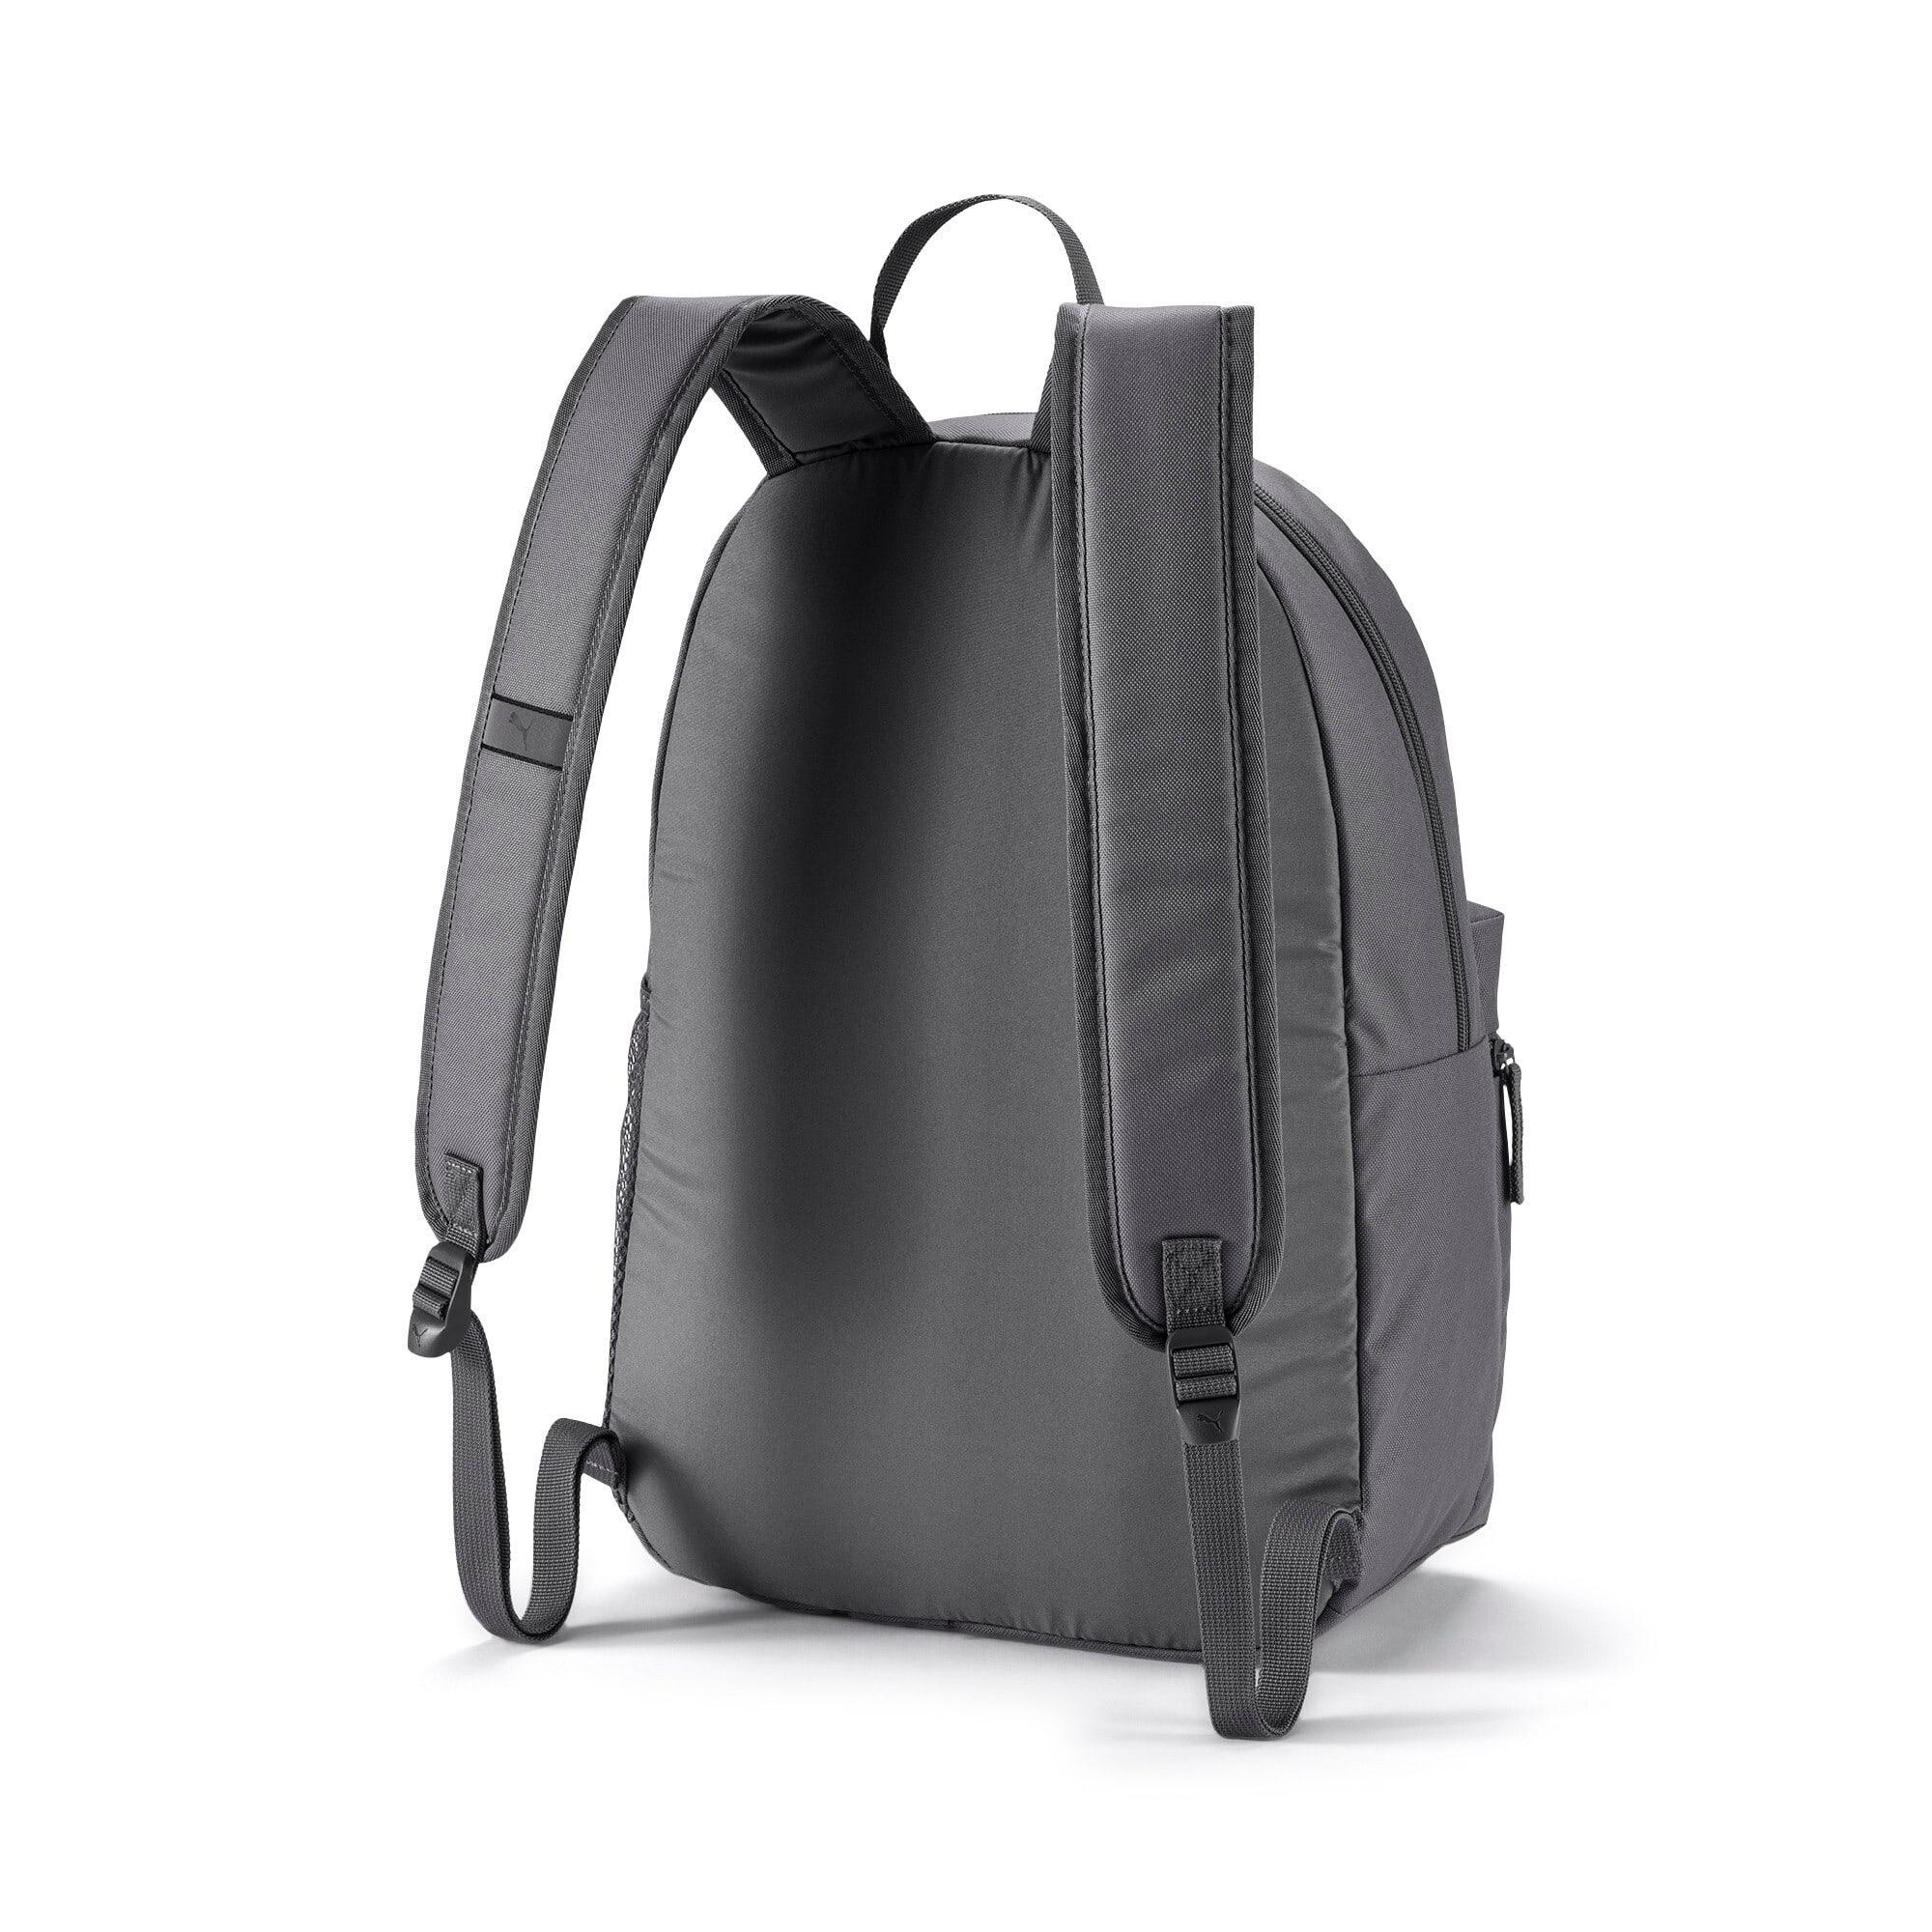 Thumbnail 2 of Phase Backpack, CASTLEROCK, medium